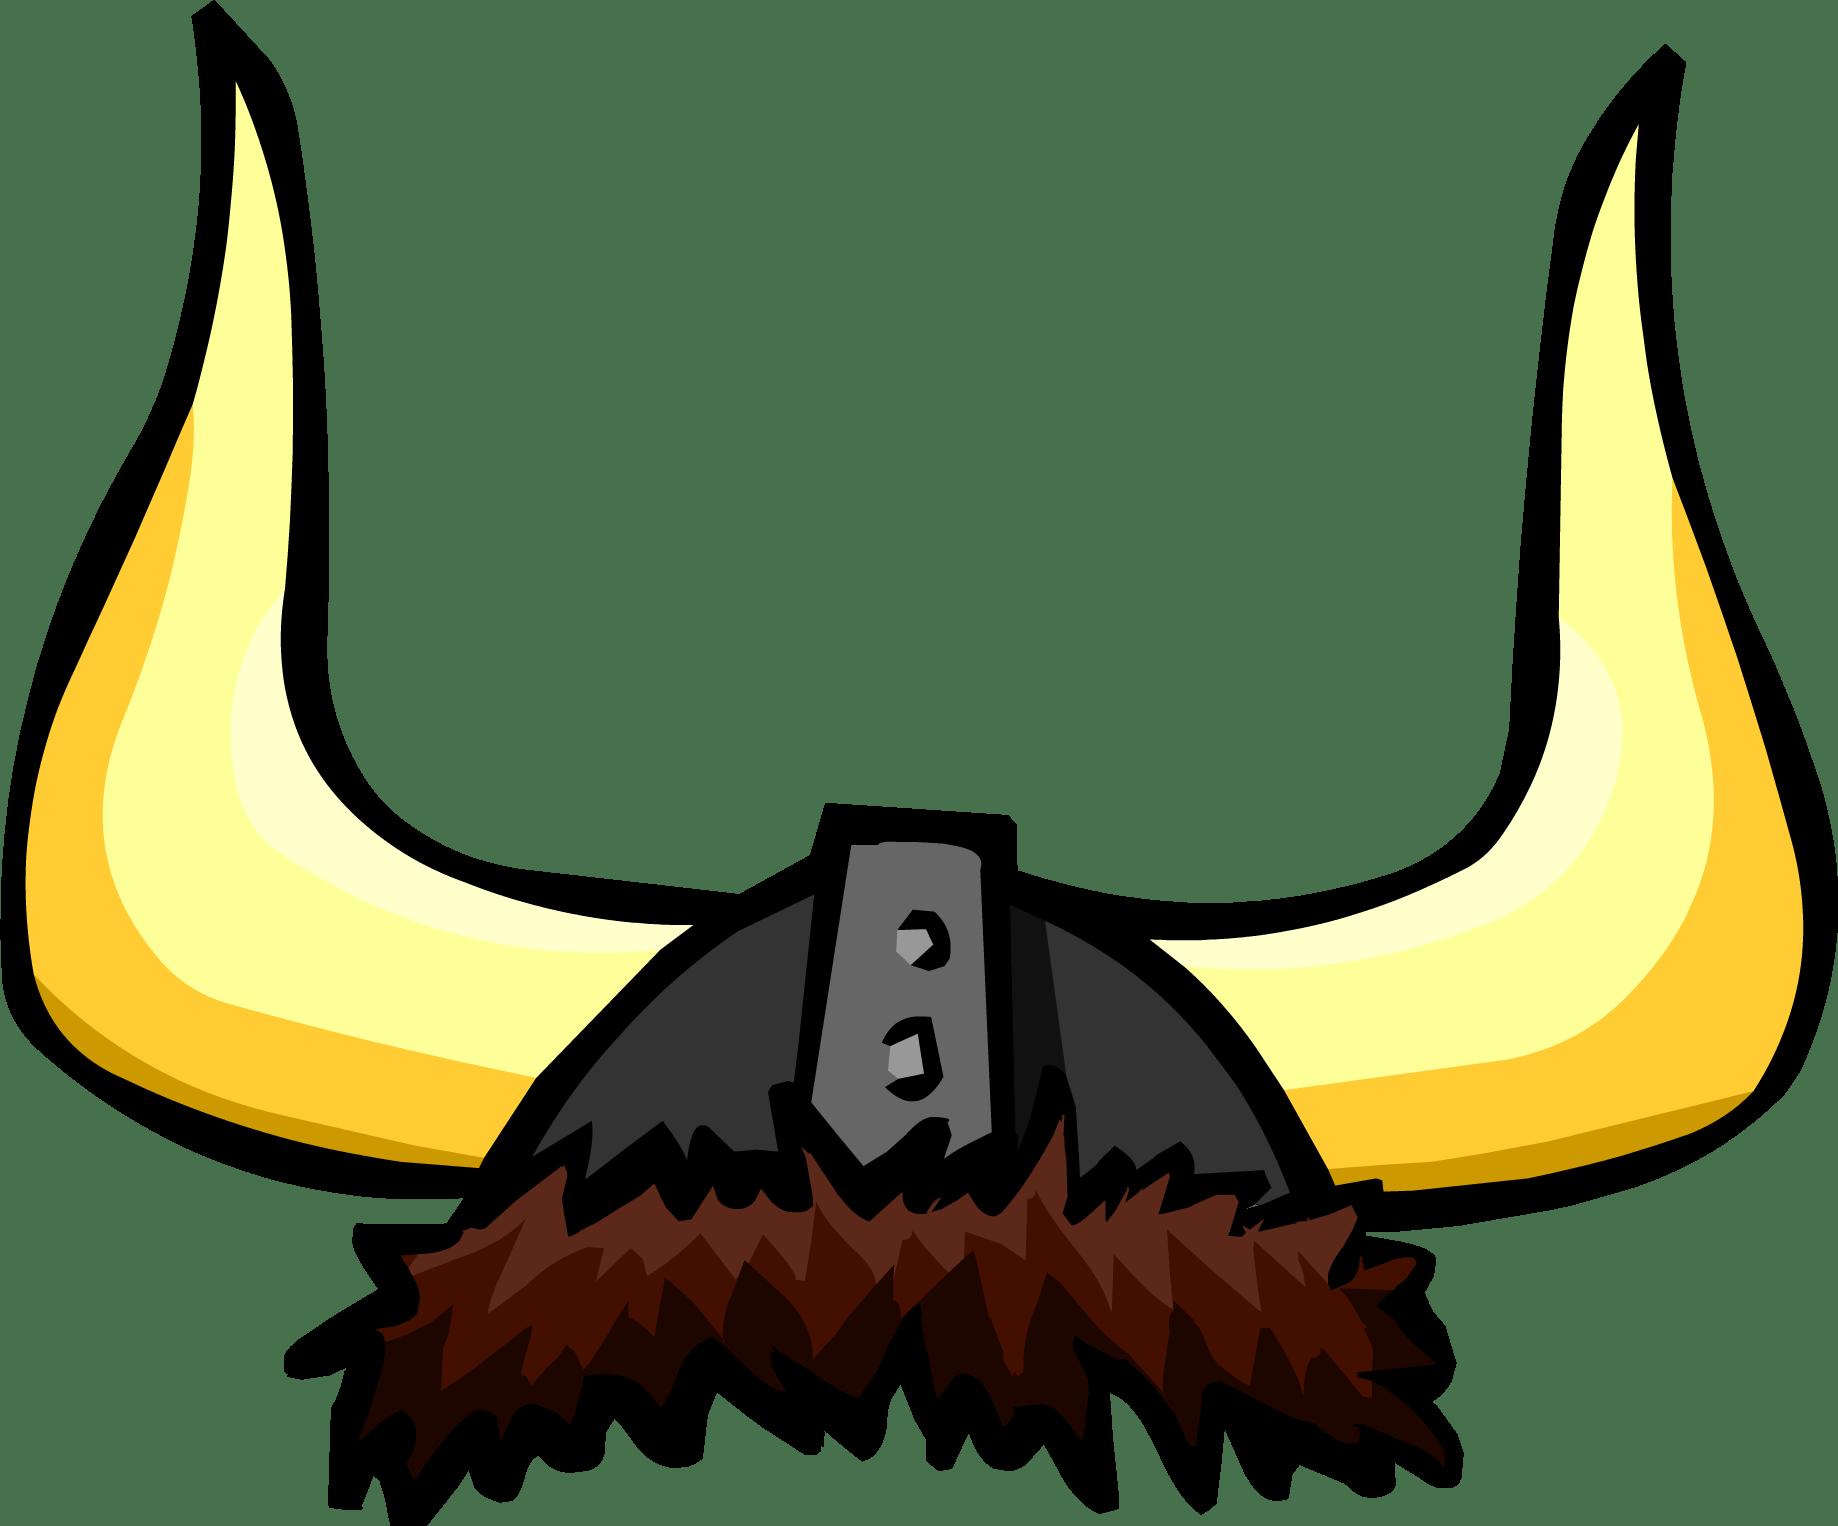 large viking helmet transparent png stickpng rh stickpng com Viking Helmet Silhouette minnesota viking helmet clip art